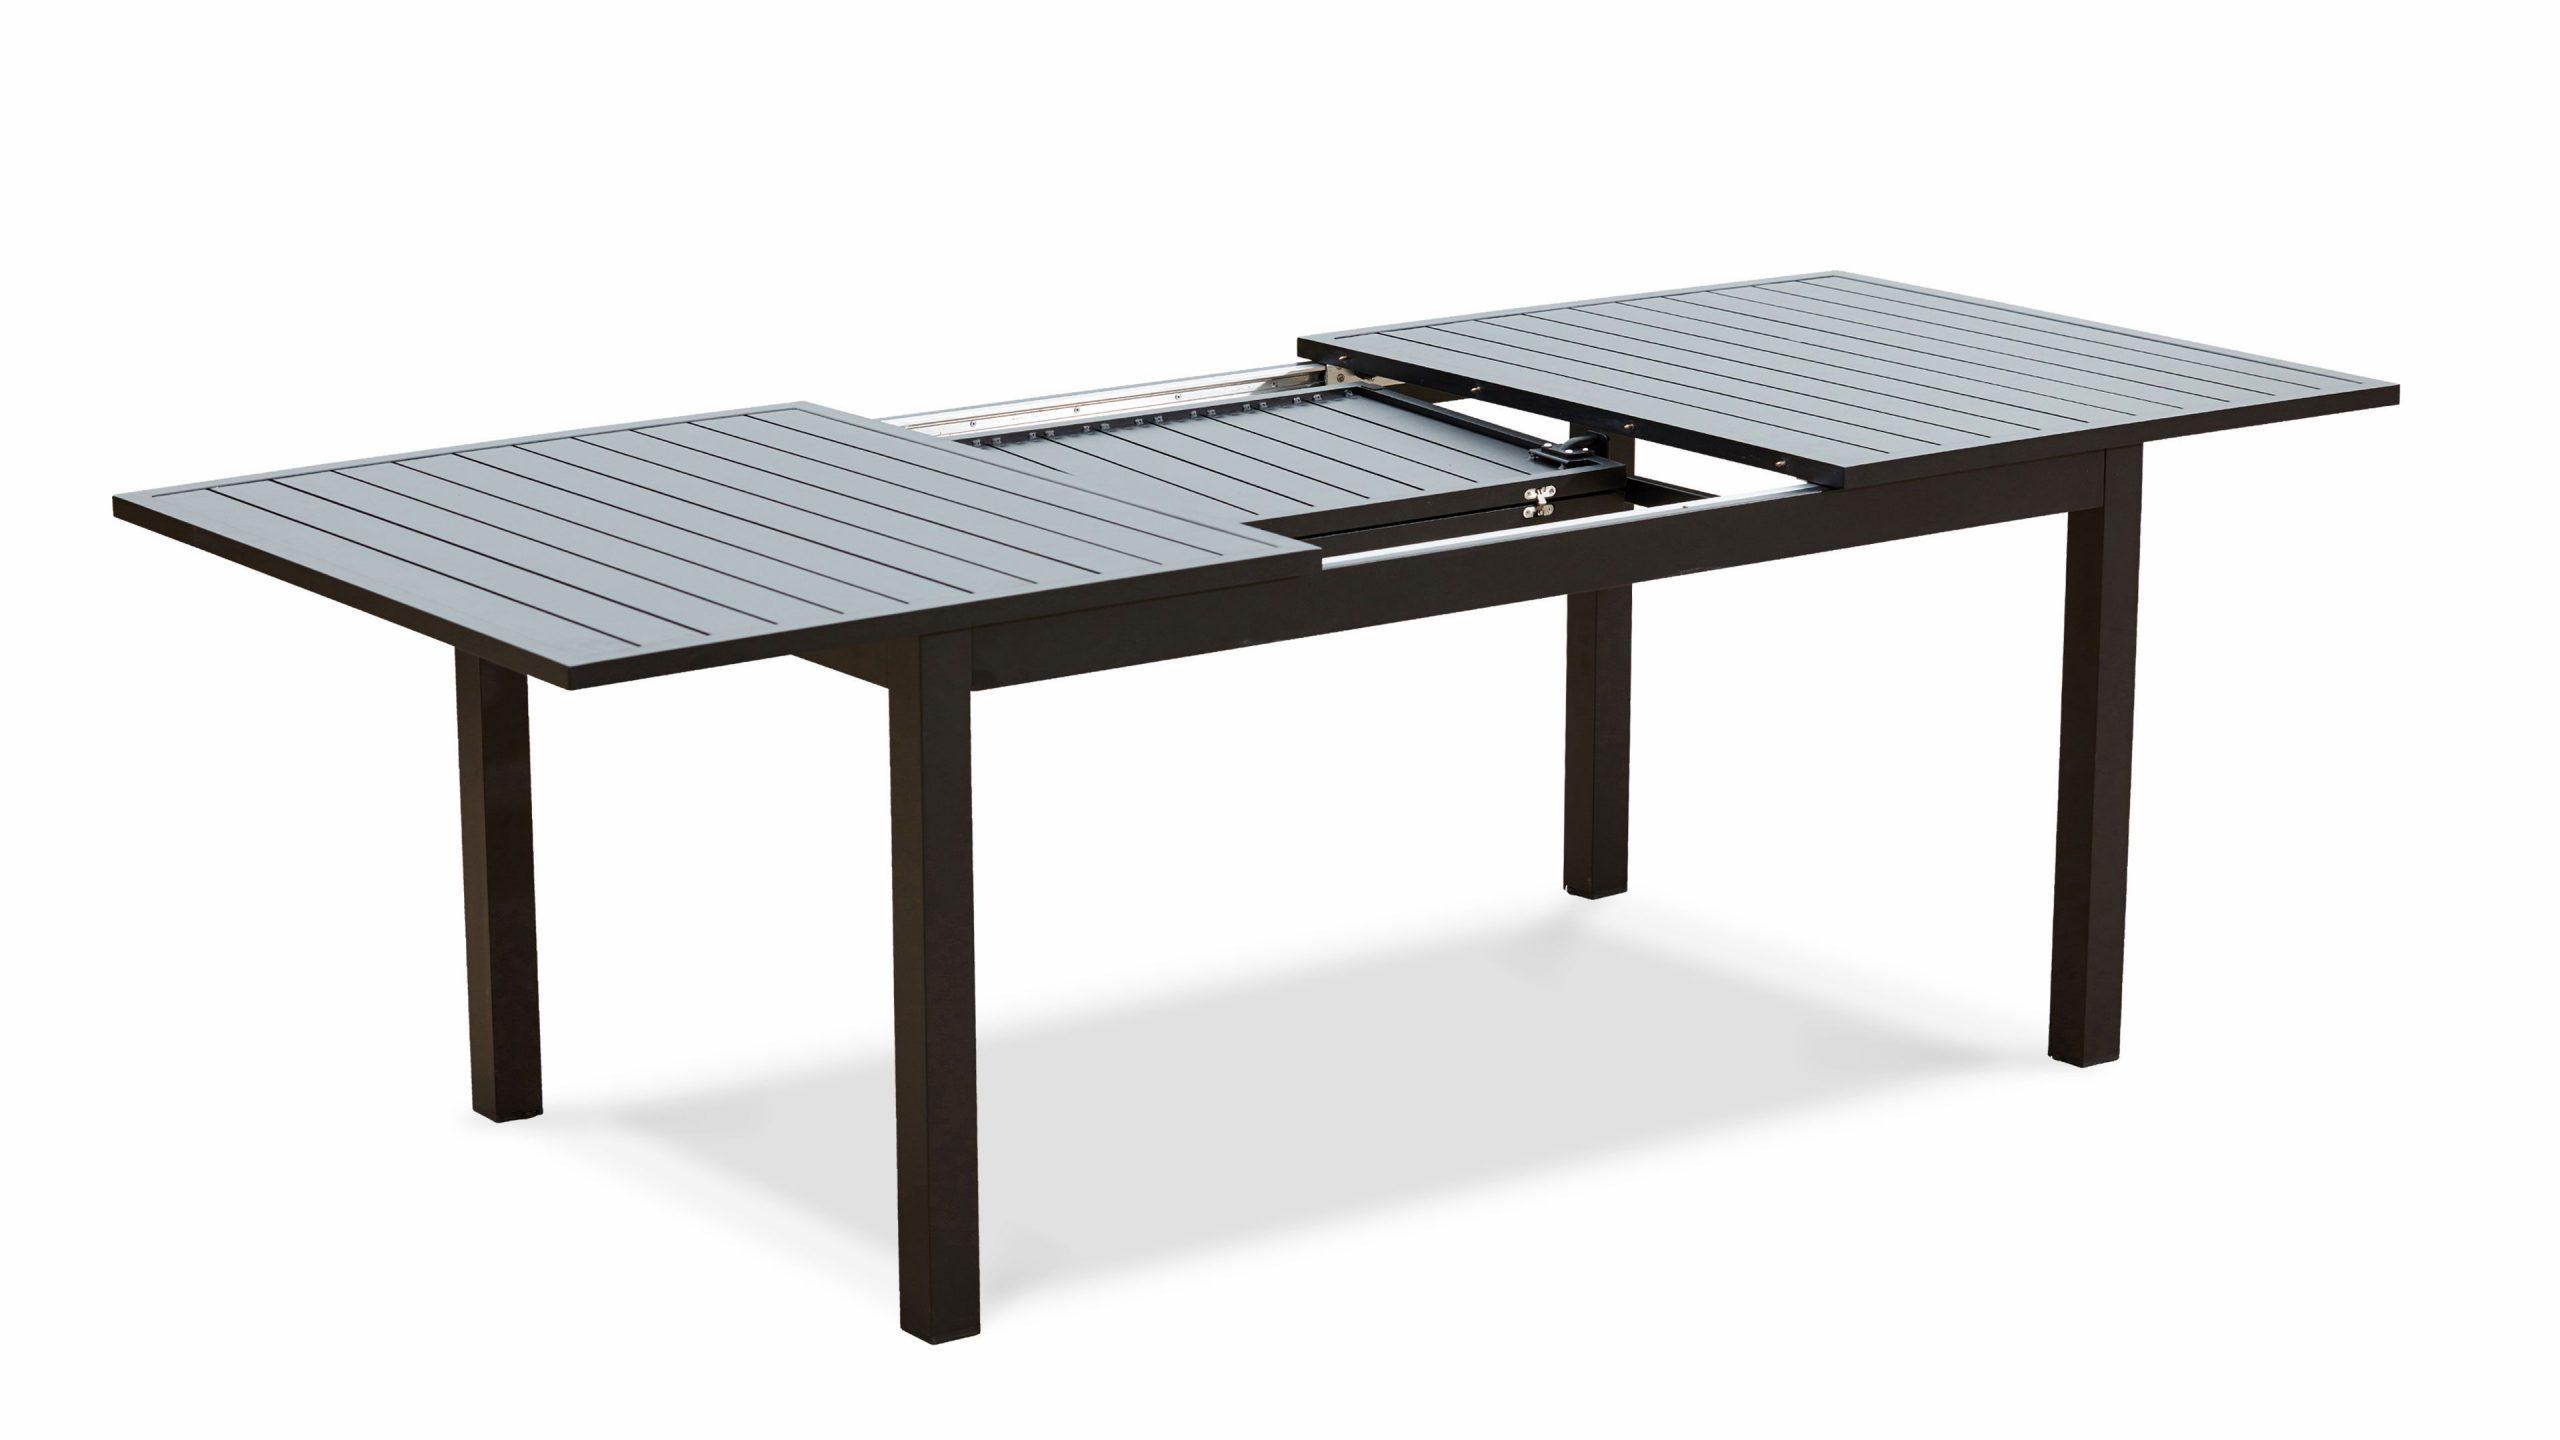 Table Jardin Extensible Rallonge 174/238 Cm Aluminium encequiconcerne Table De Jardin En Solde